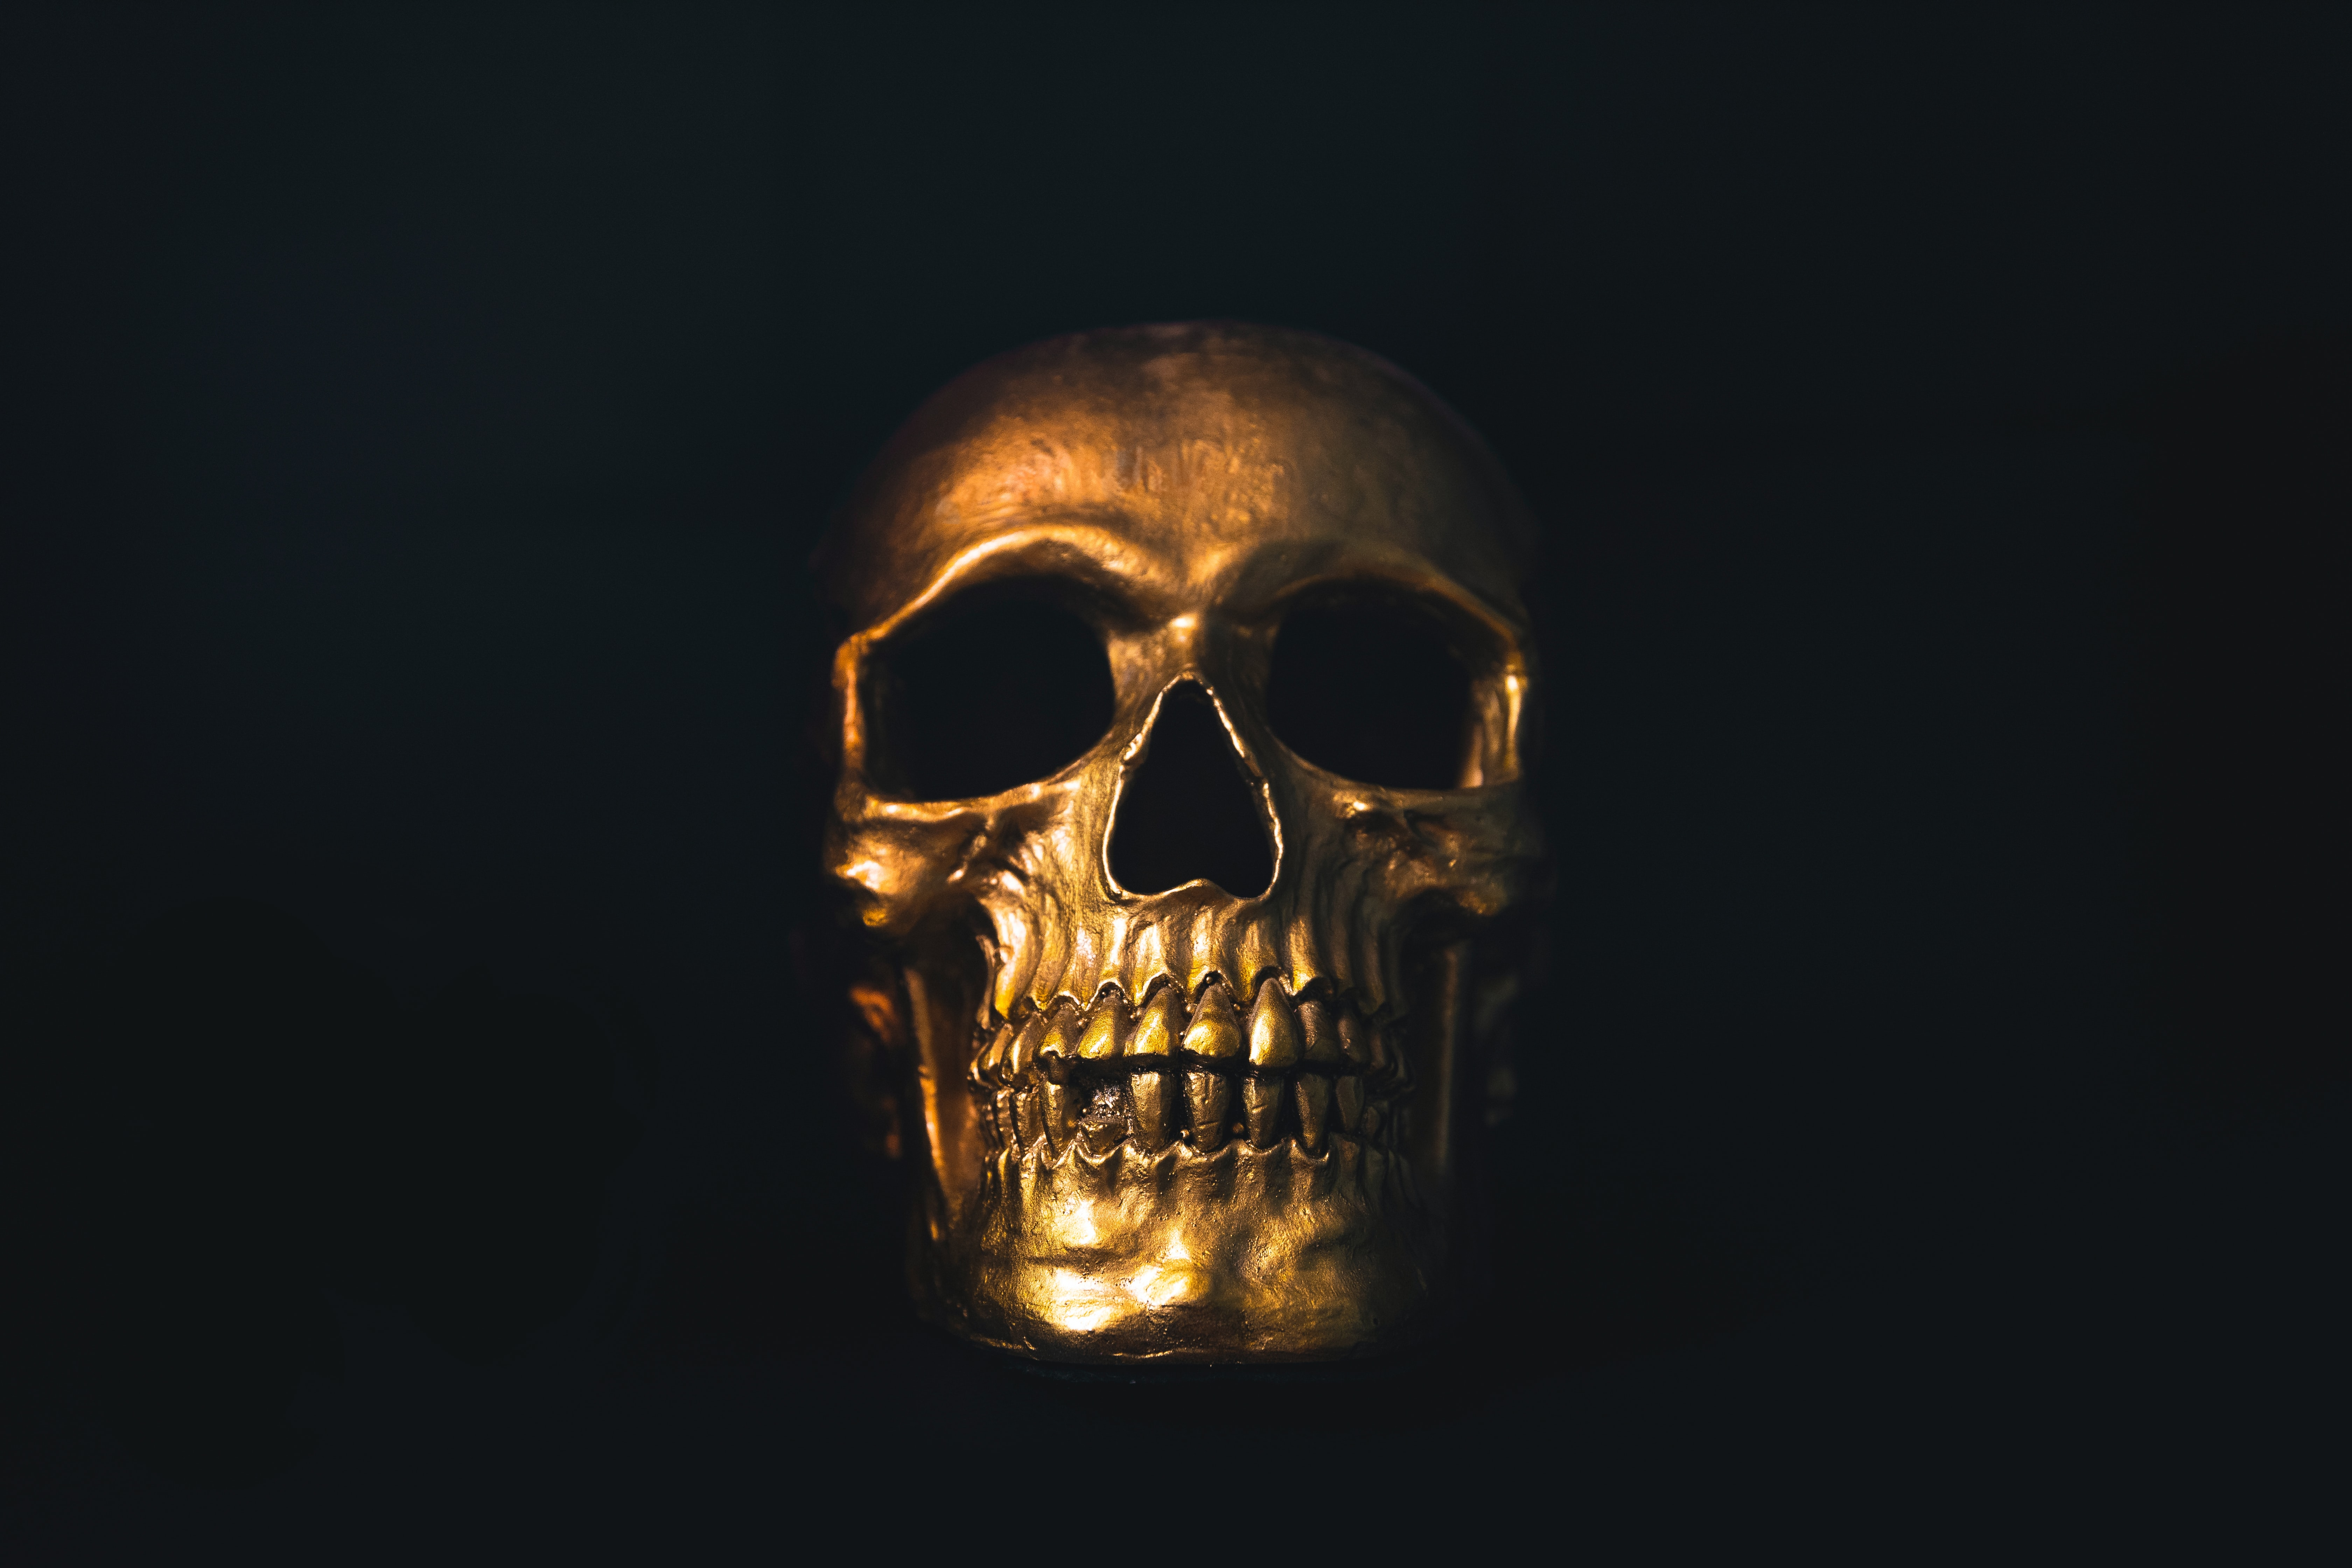 Decorative Skull, Barrel of Bones Solve Missing Persons Cases